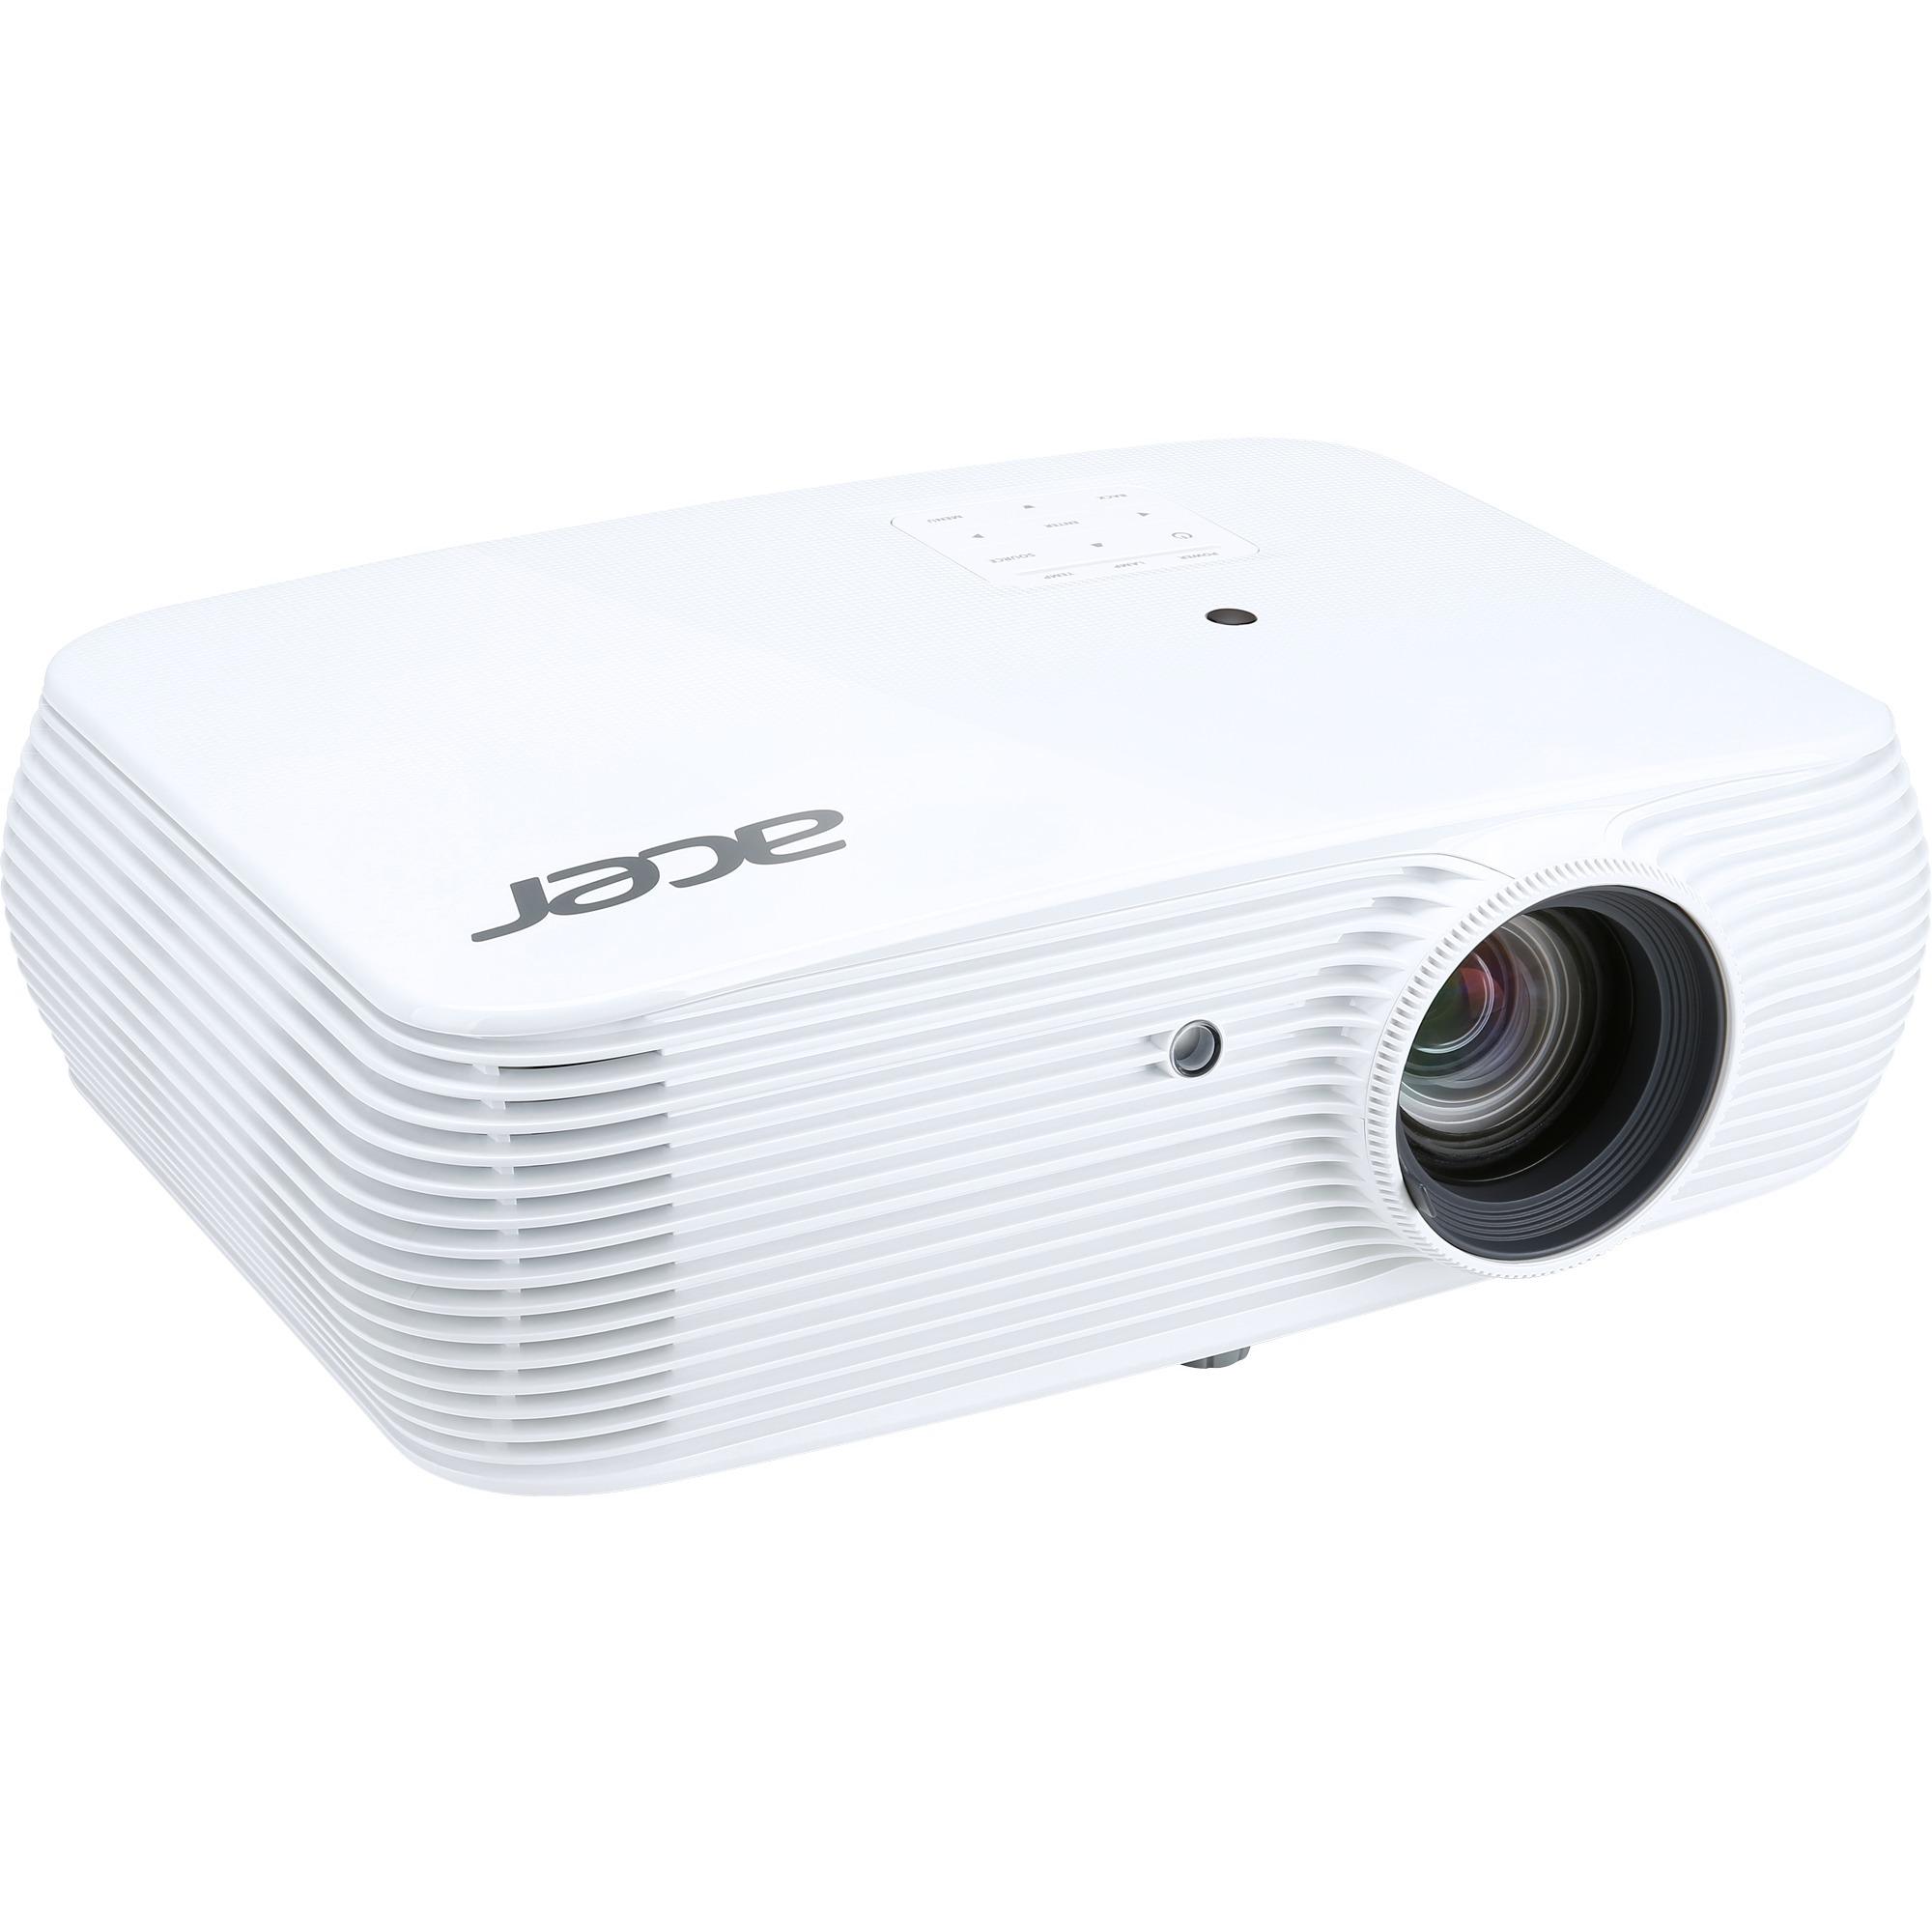 Business P5630 videoproyector 4000 lúmenes ANSI DLP WUXGA (1920x1200) 3D Proyector para montar en pared Blanco, Proyector DLP